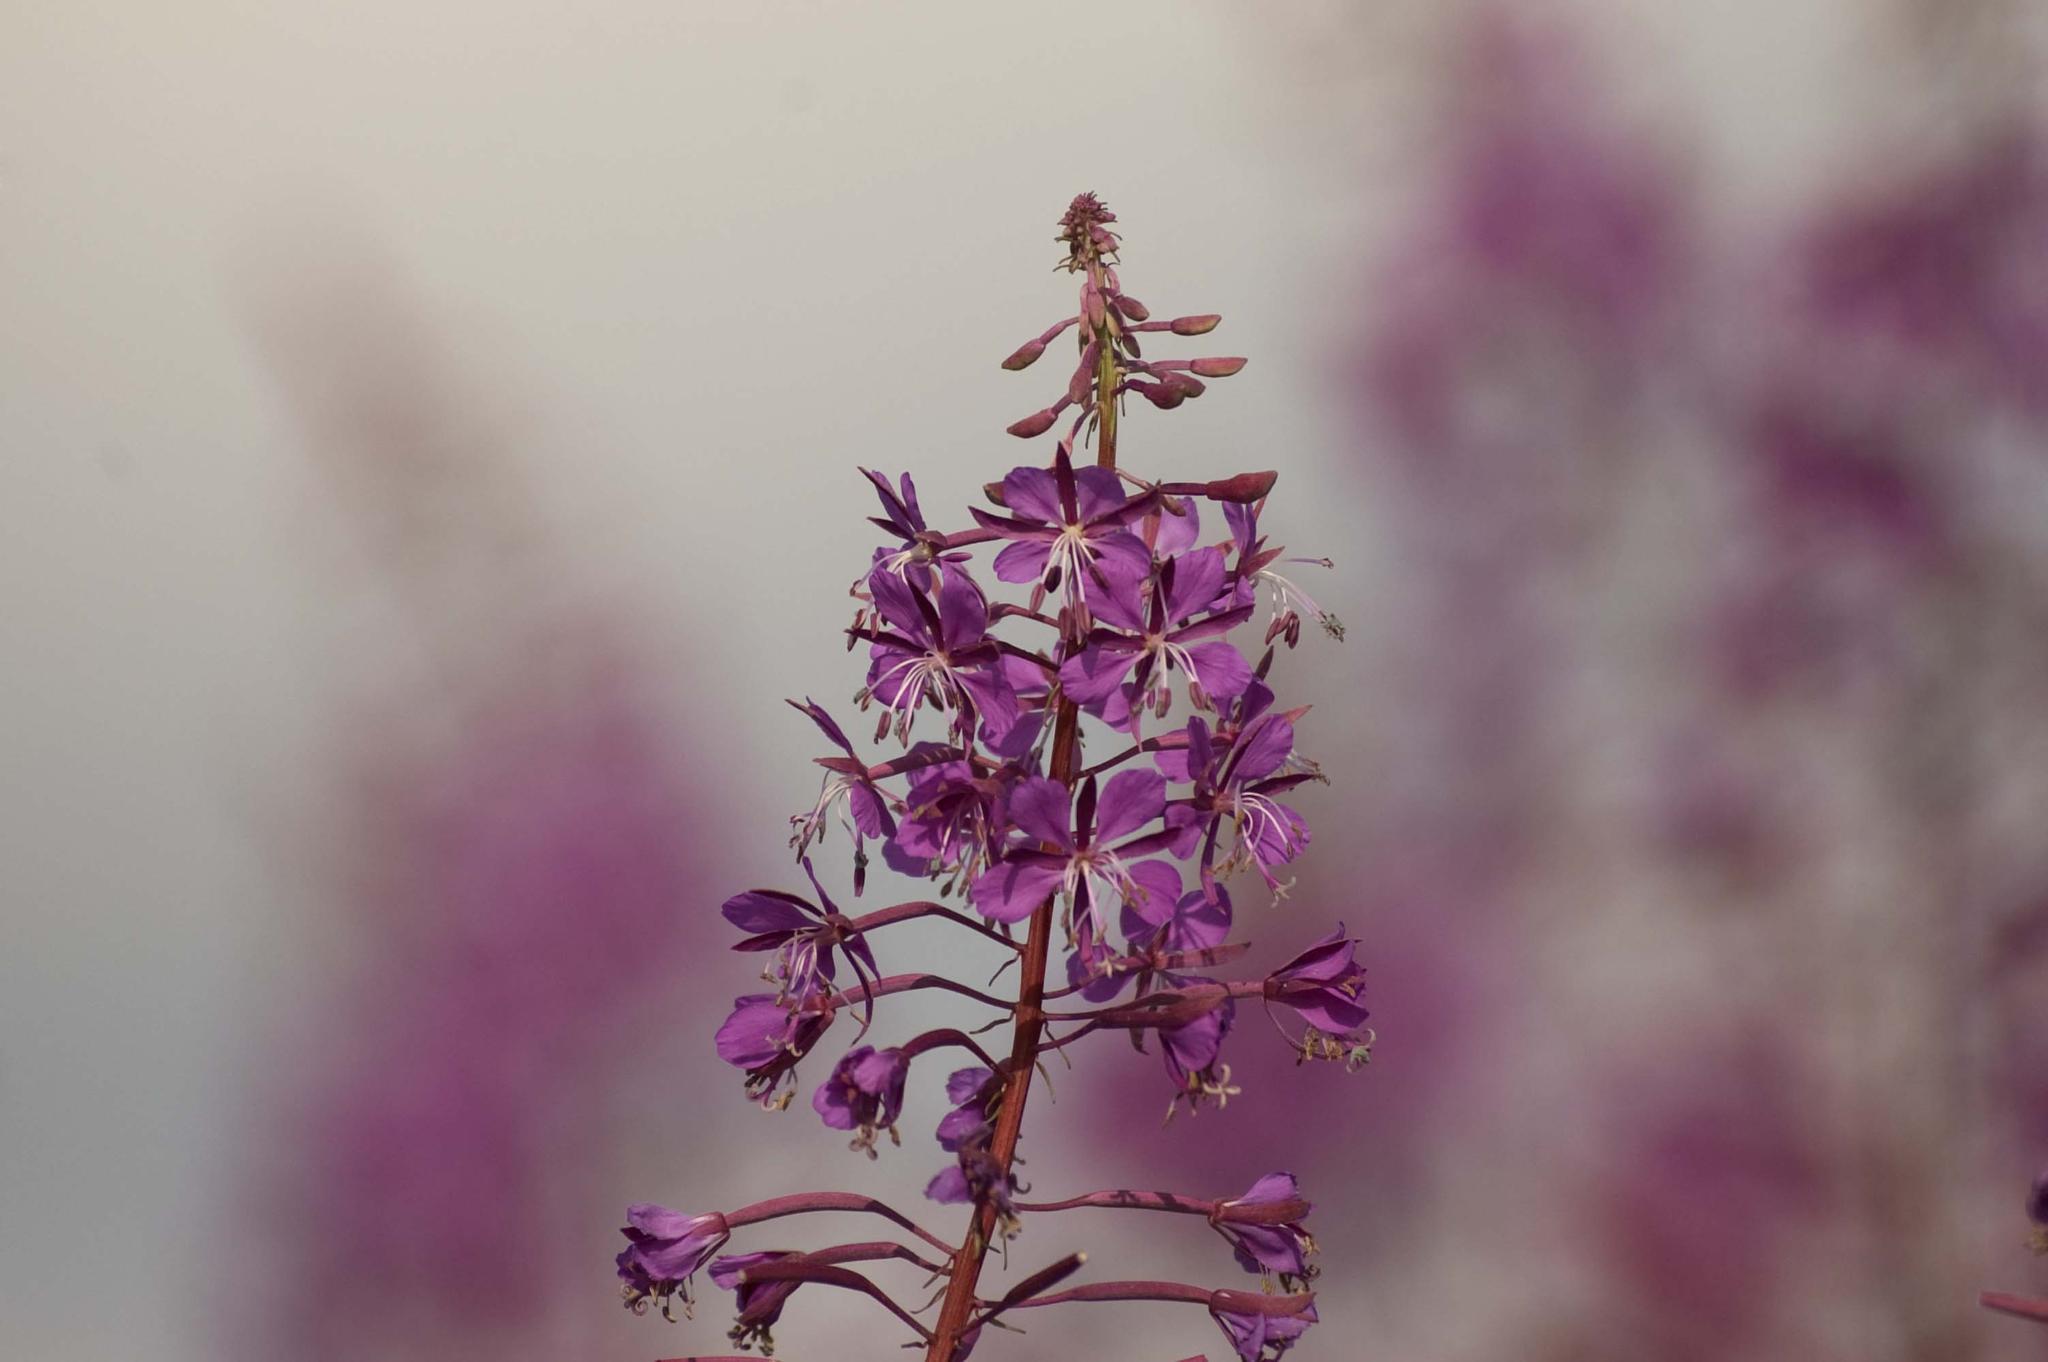 Wild flowers by leslie.mcbeath